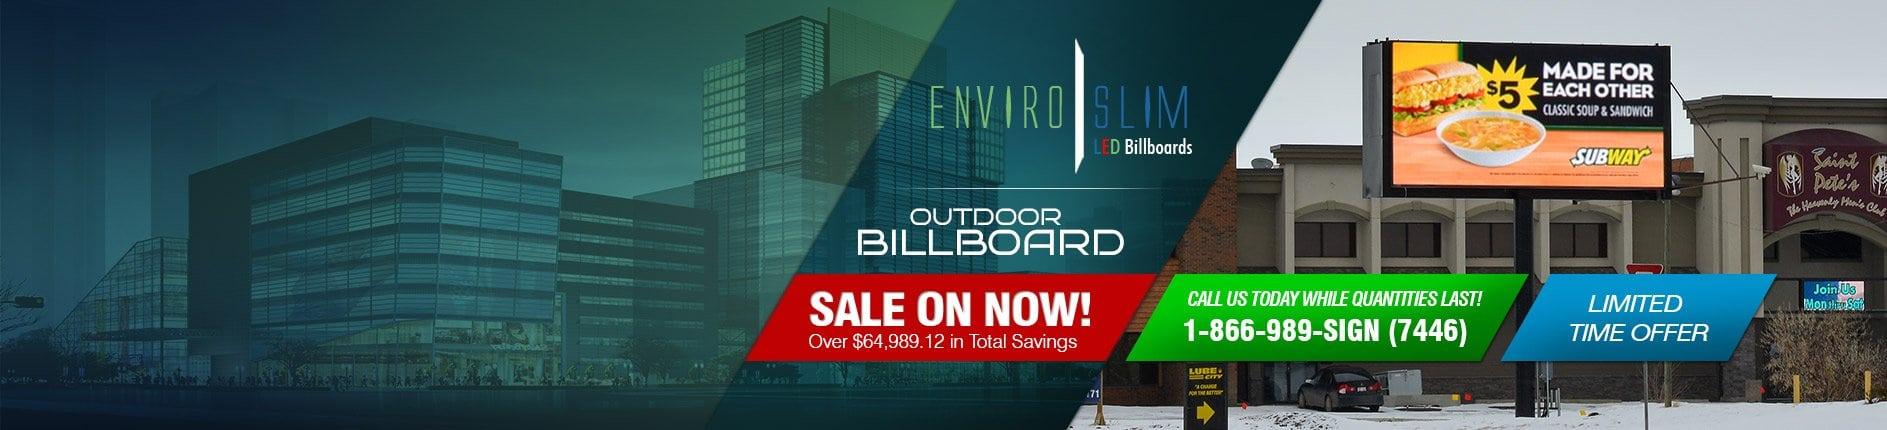 Outdoor LED Billboards